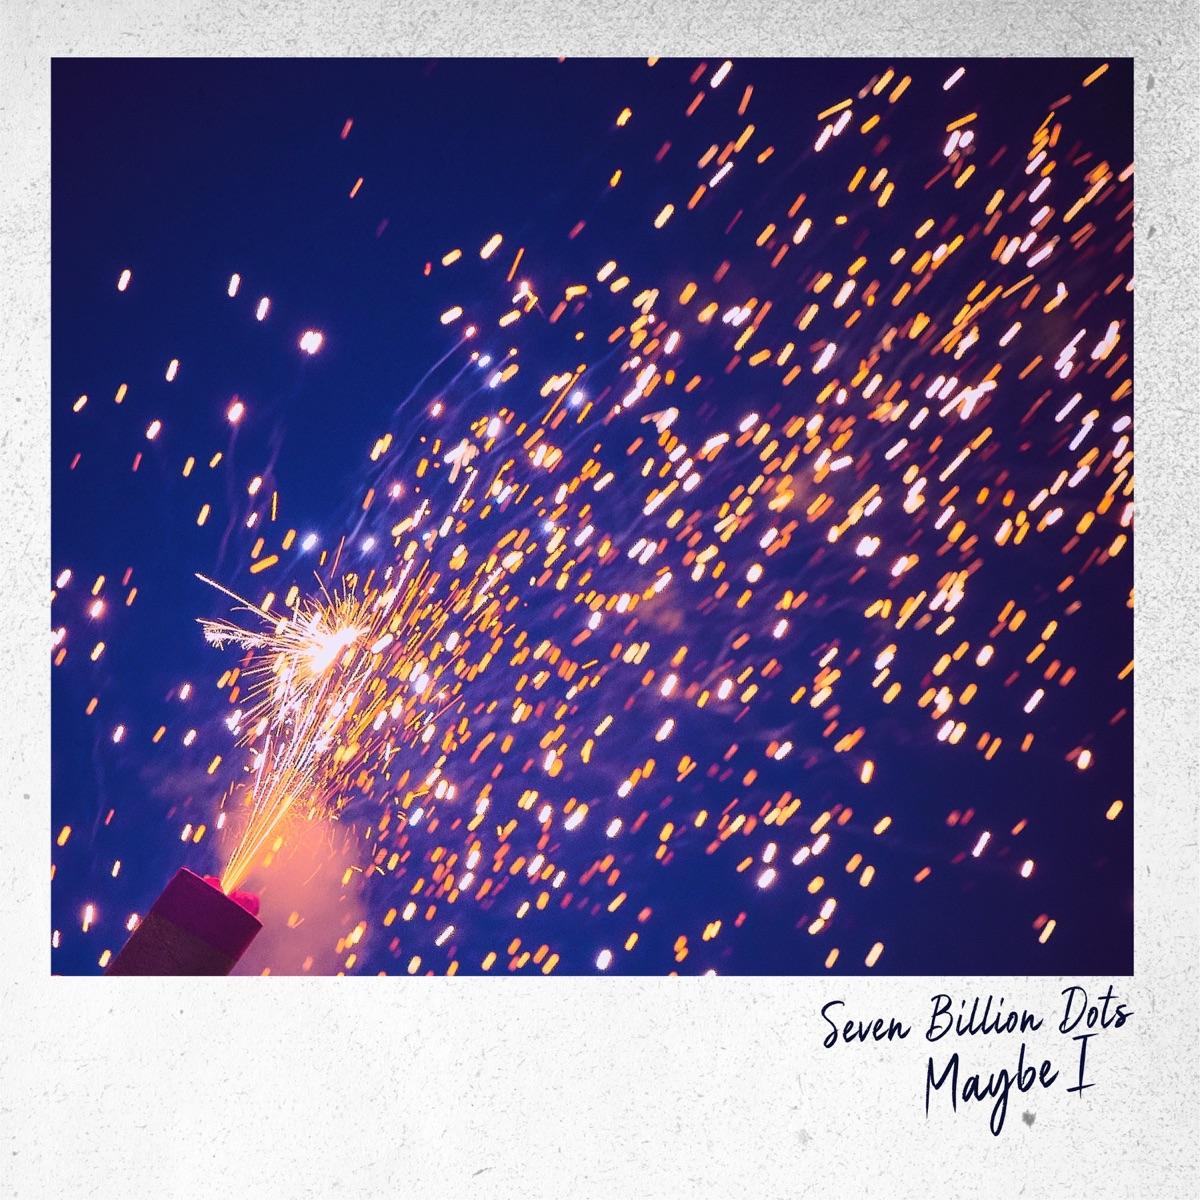 『Seven Billion Dots - Maybe I 歌詞』収録の『Maybe I』ジャケット